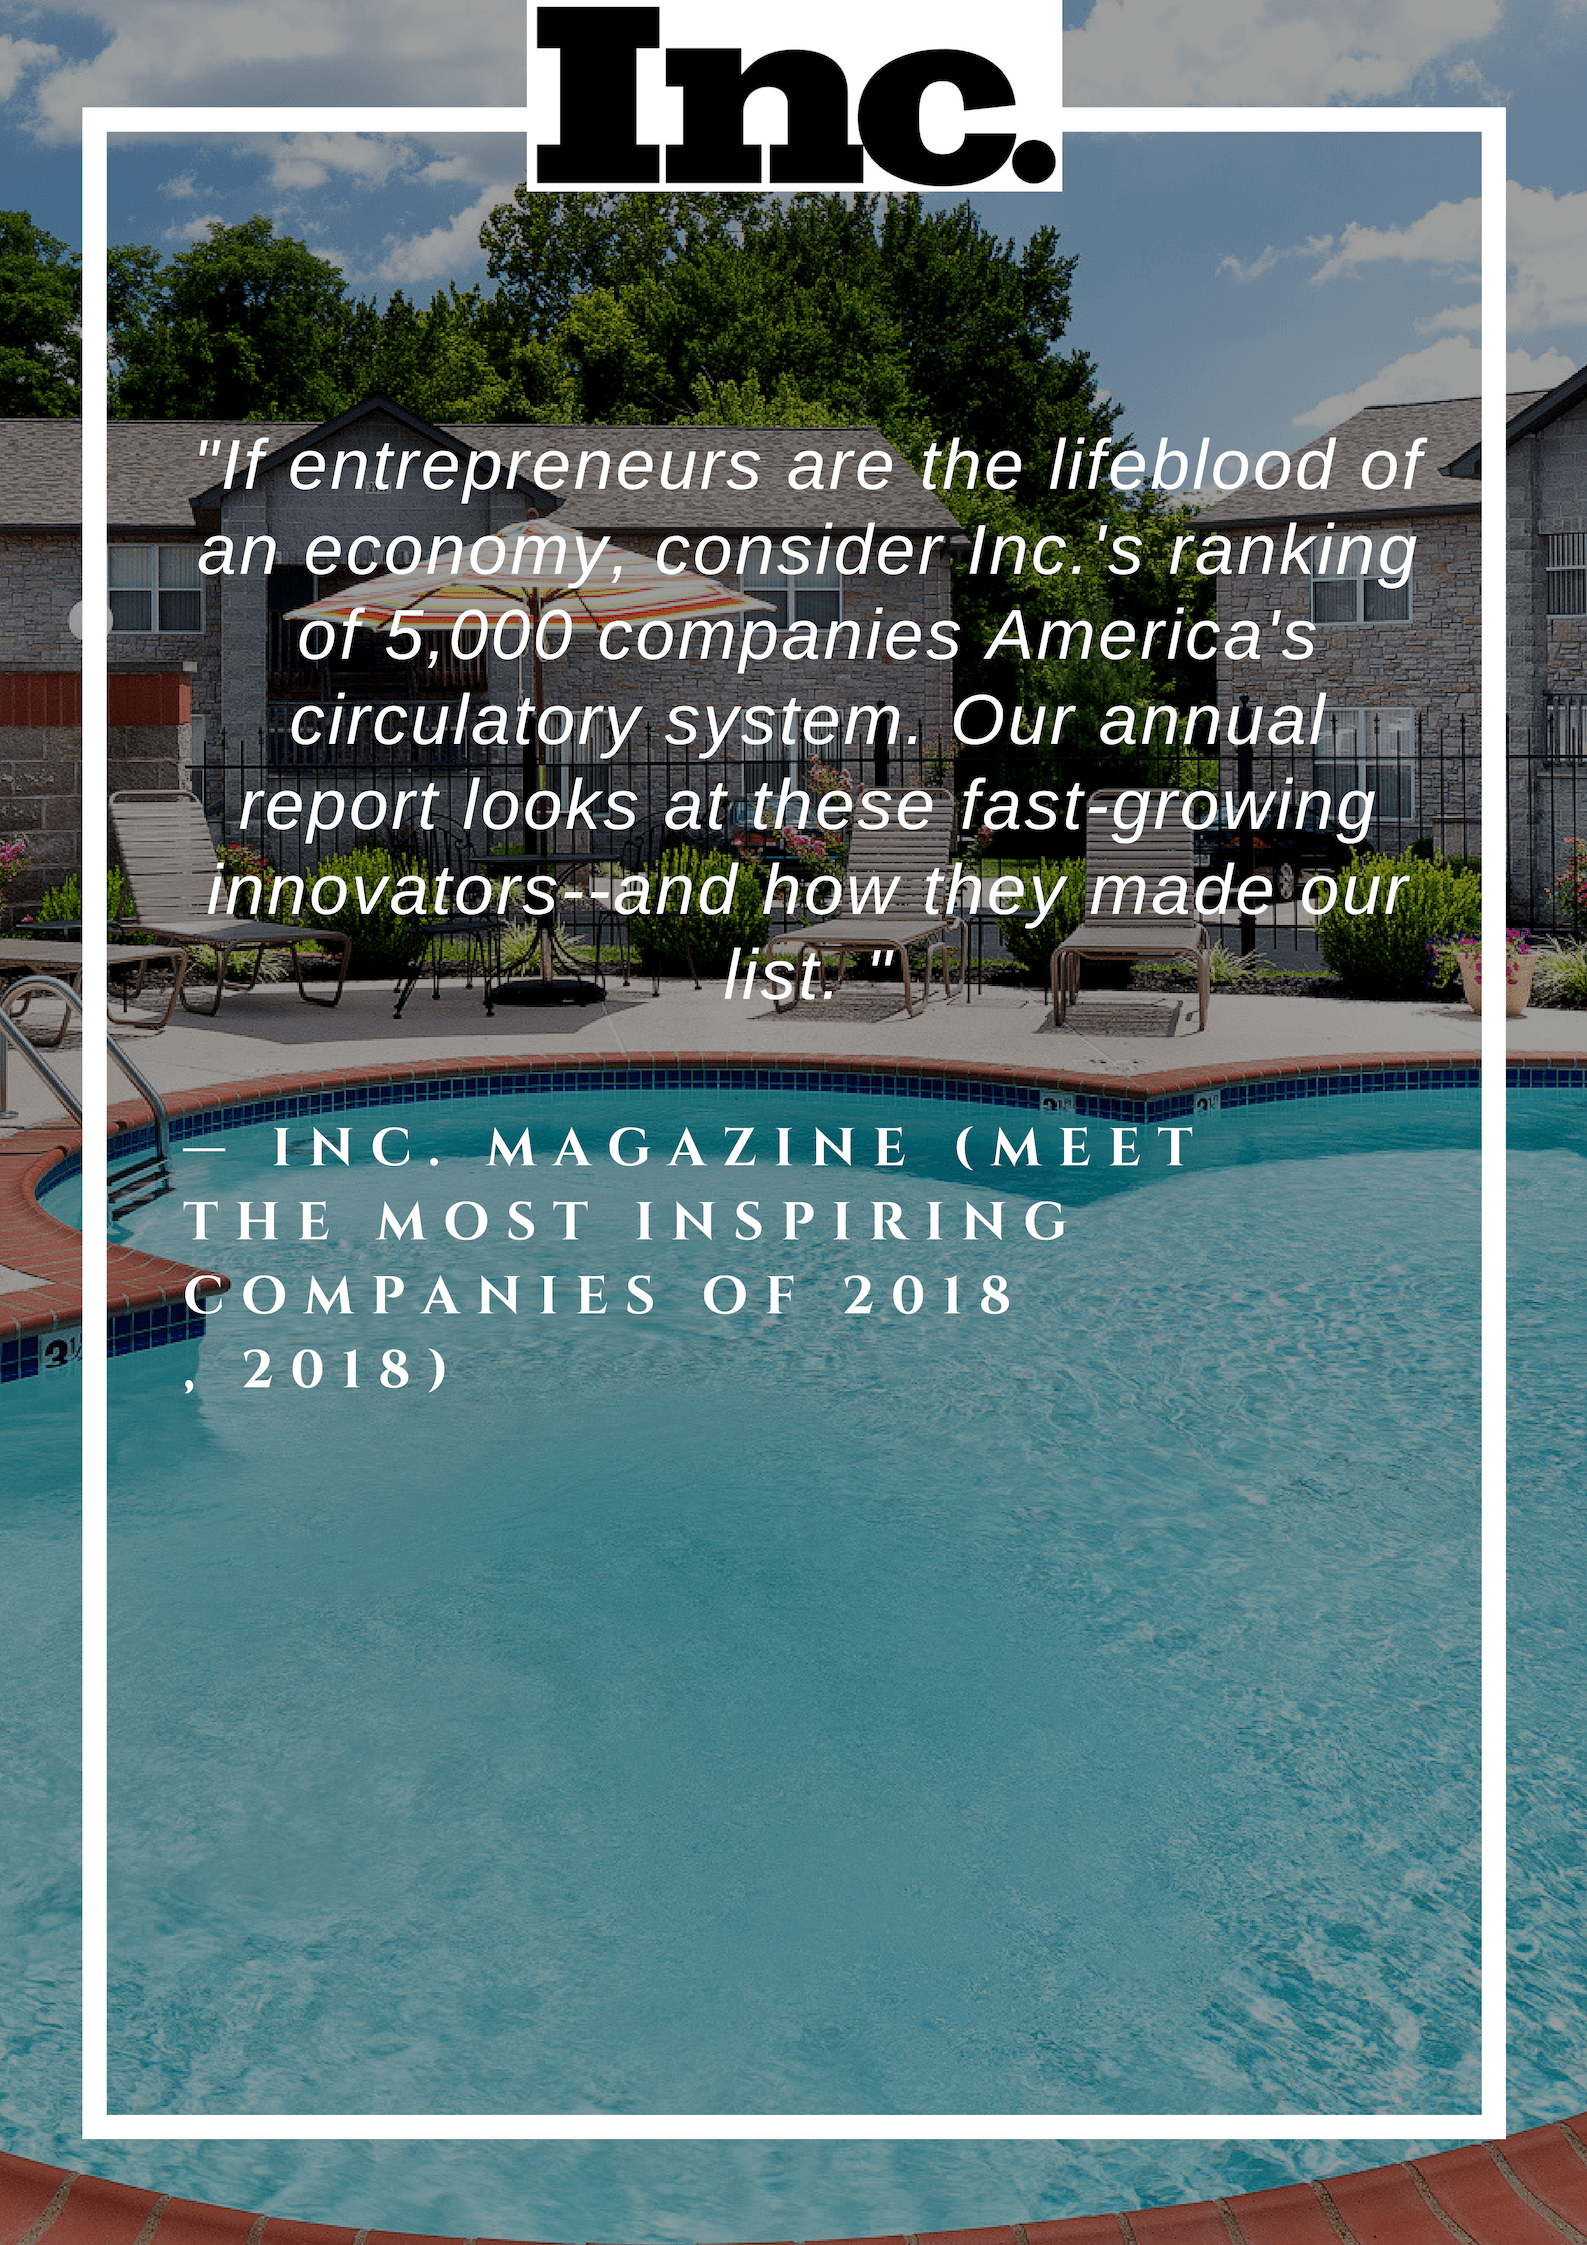 Meet the Most Inspiring Companies of 2018